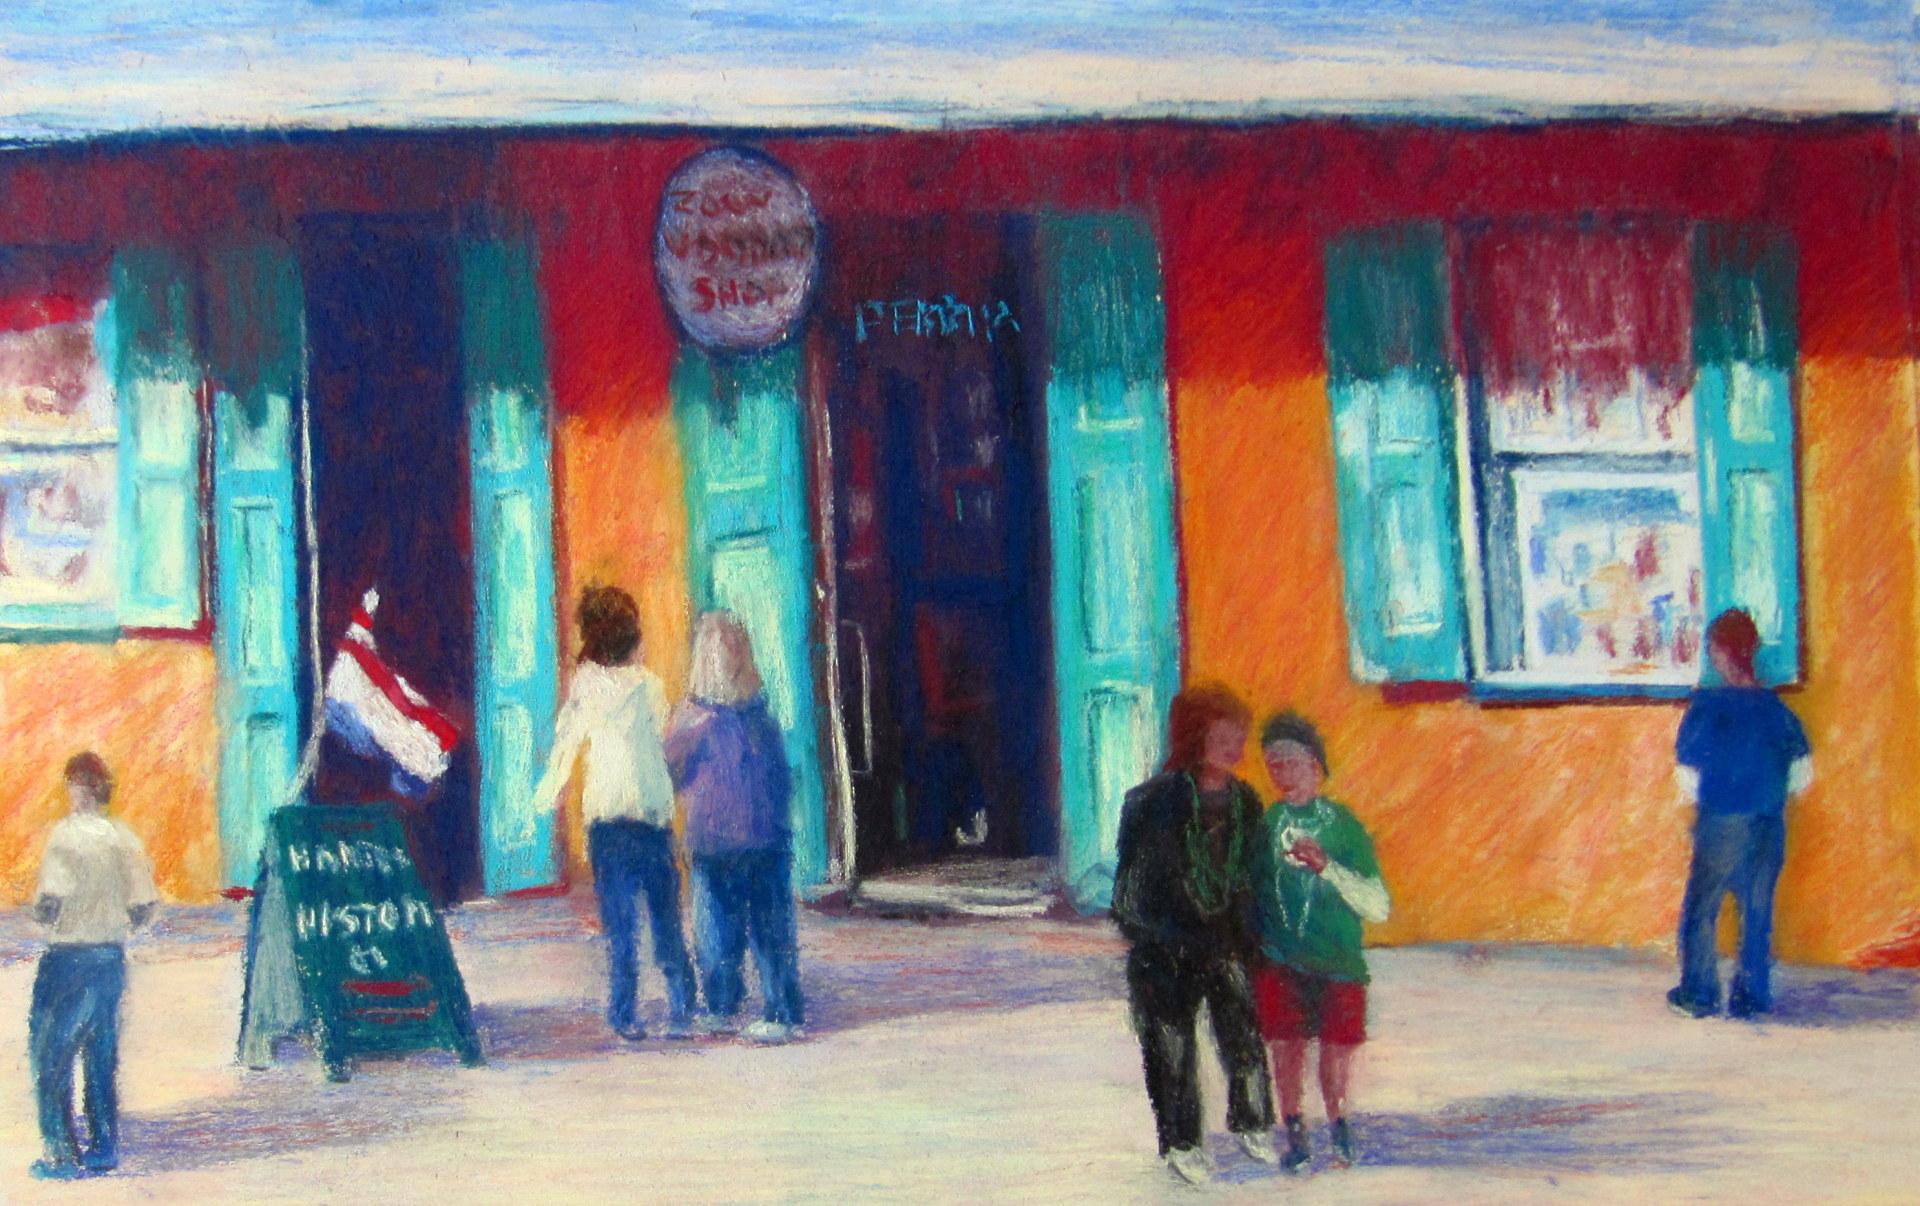 New Orleans Voodoo Shop